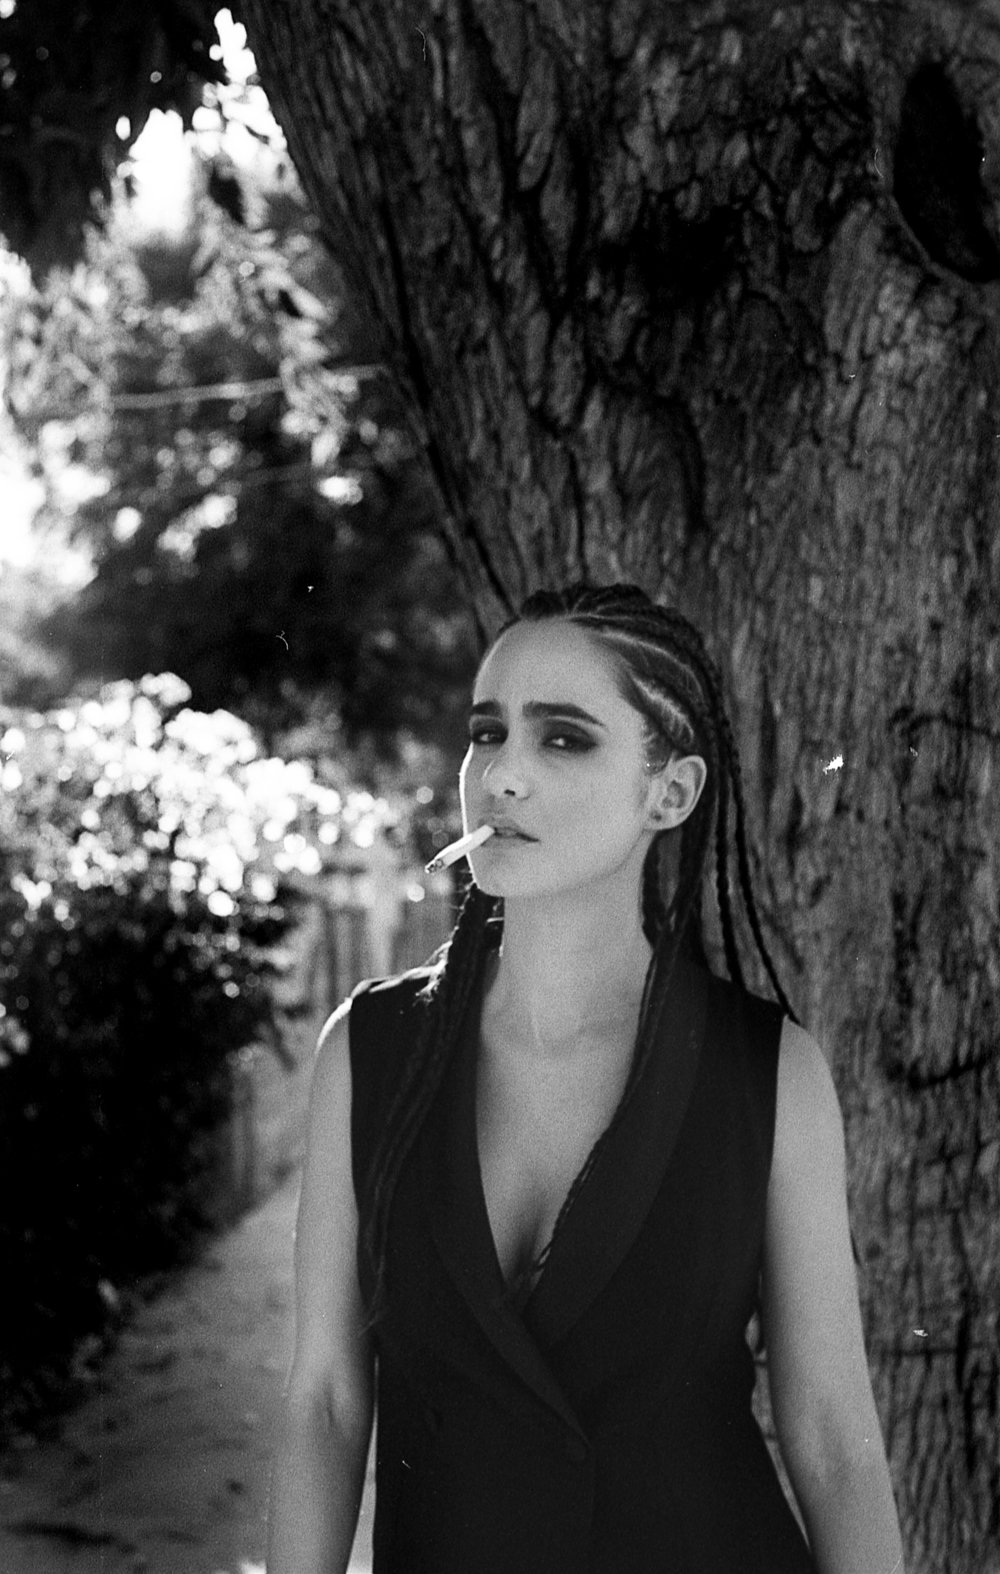 Alicia_Sanz.jpg